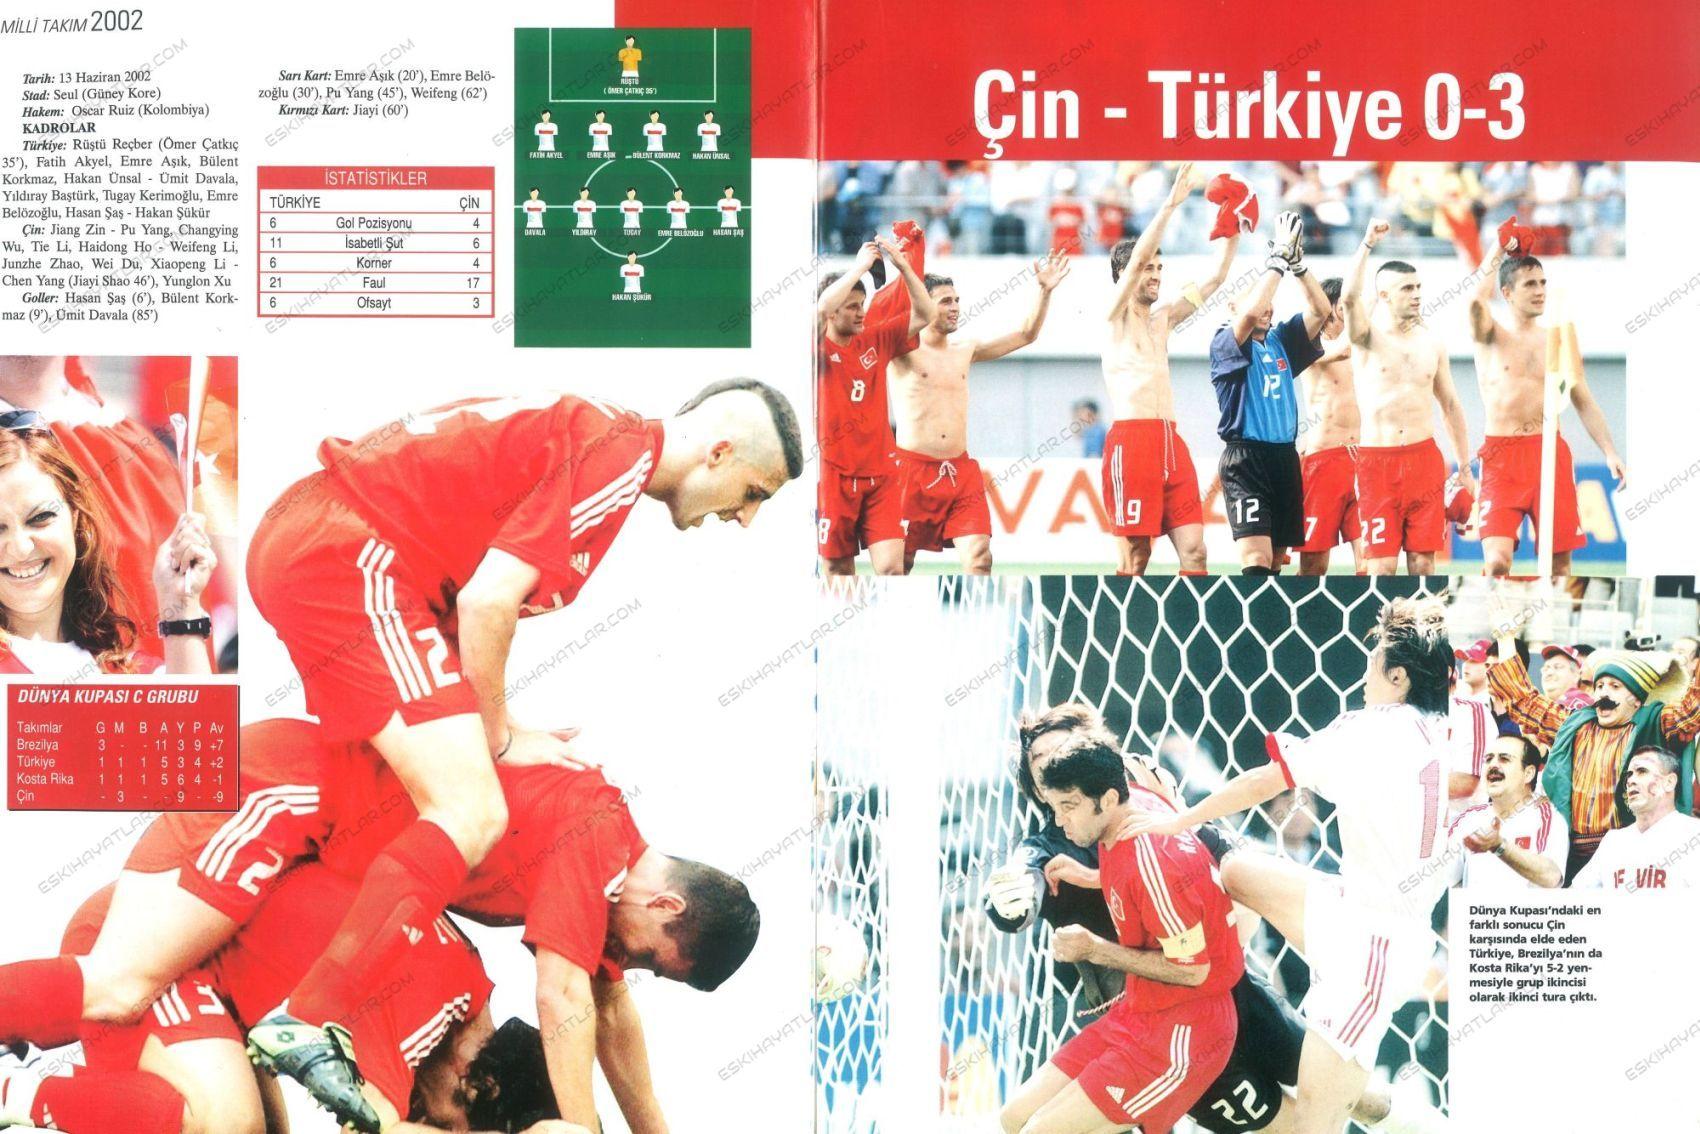 0406-turkiye-a-milli-takimi-2002-dunya-kupasi-kadrosu-aktuel-dergisi (7)